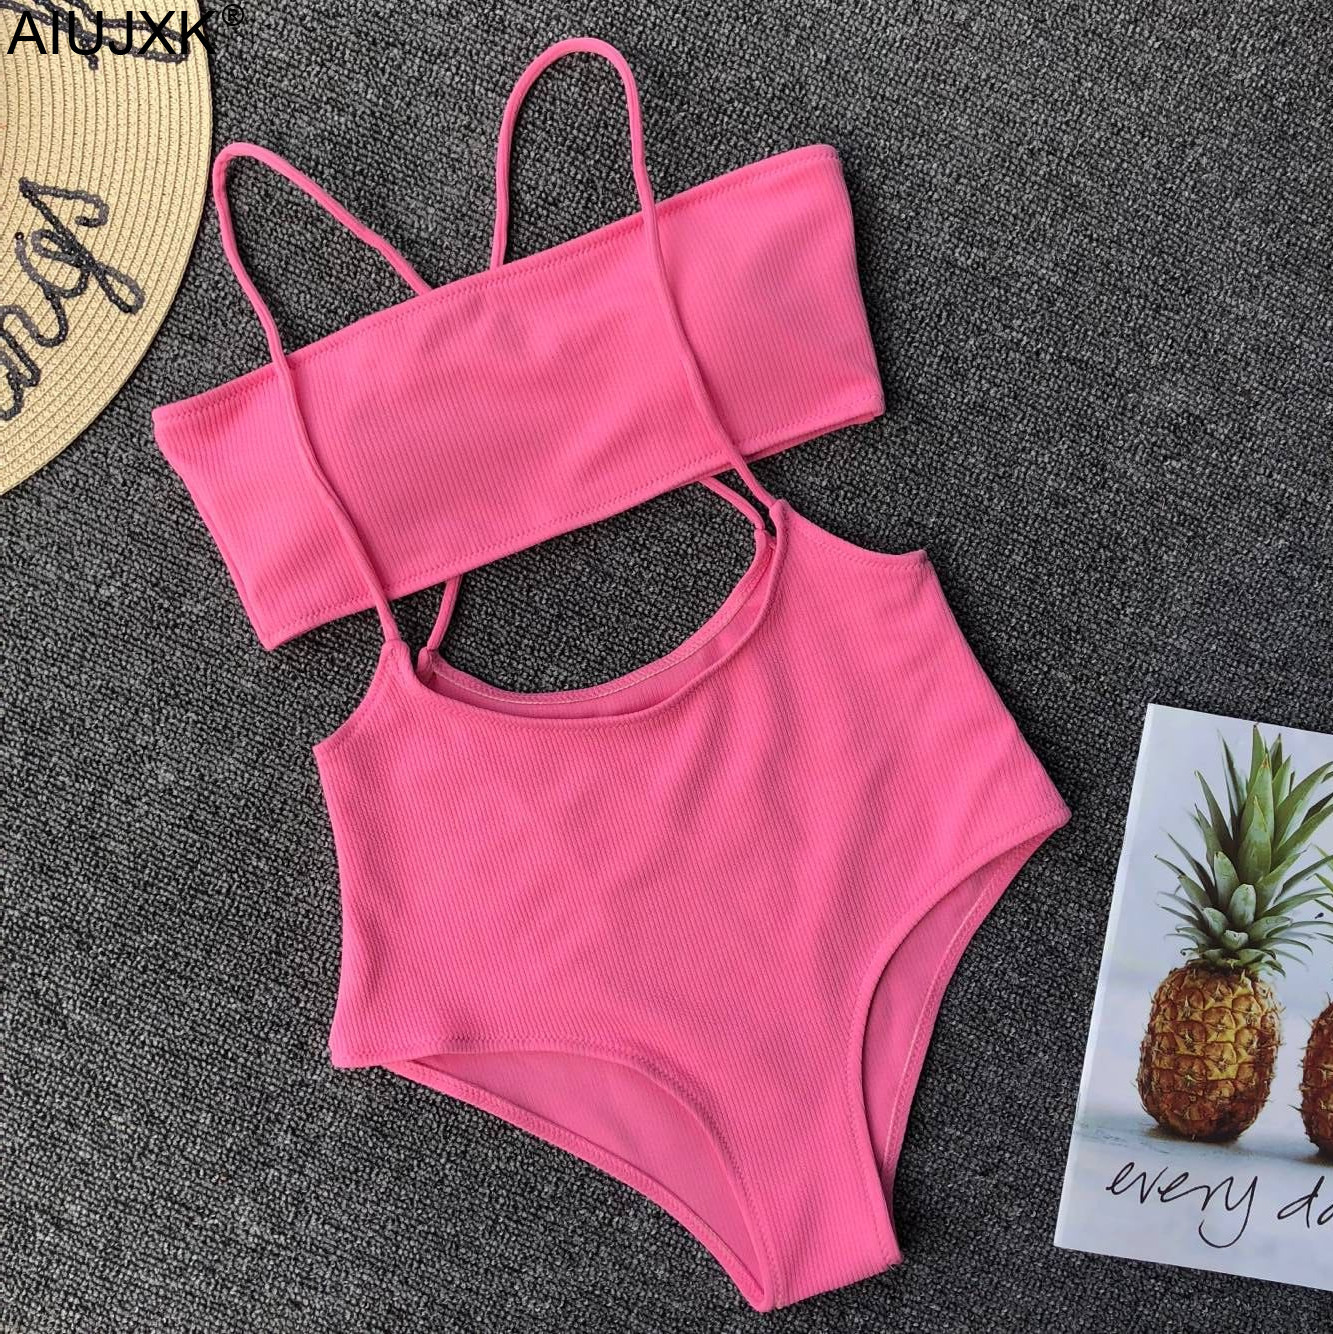 AIUJXK Fashion 6 Colors Summer Biquini   Bra     Set   Women Sexy Strap Beach Lingerie Female Swimwear 2 Piece Swimsuit Sport Underwear